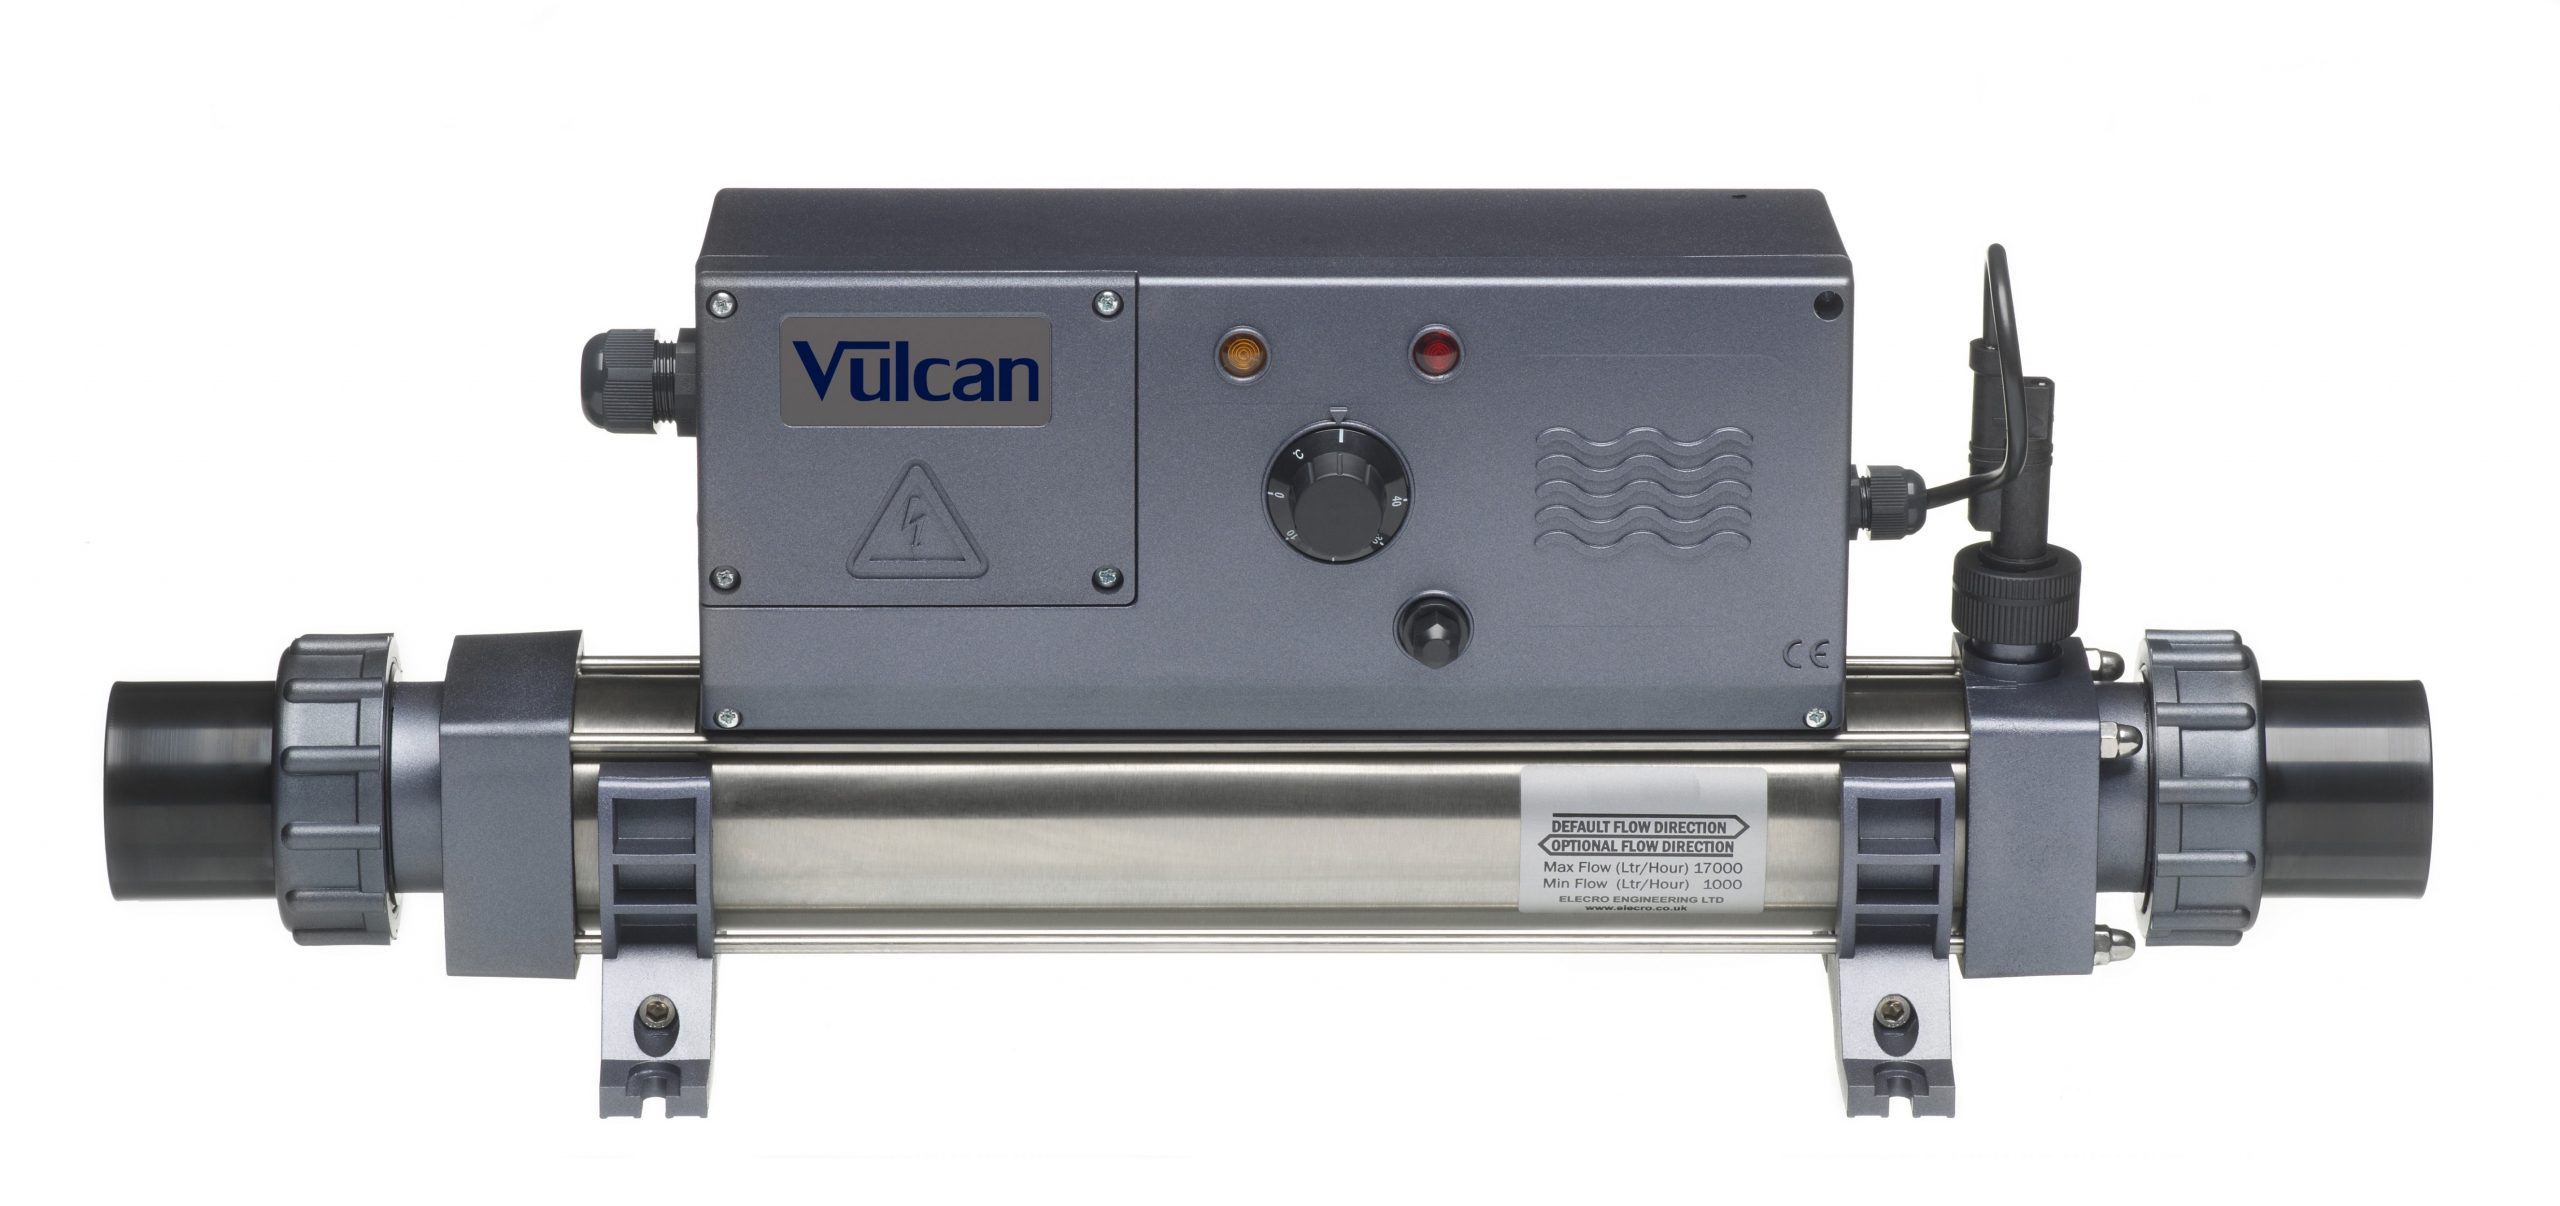 Rechauffeur Piscine Vulcan Titane destiné Réchauffeur Piscine